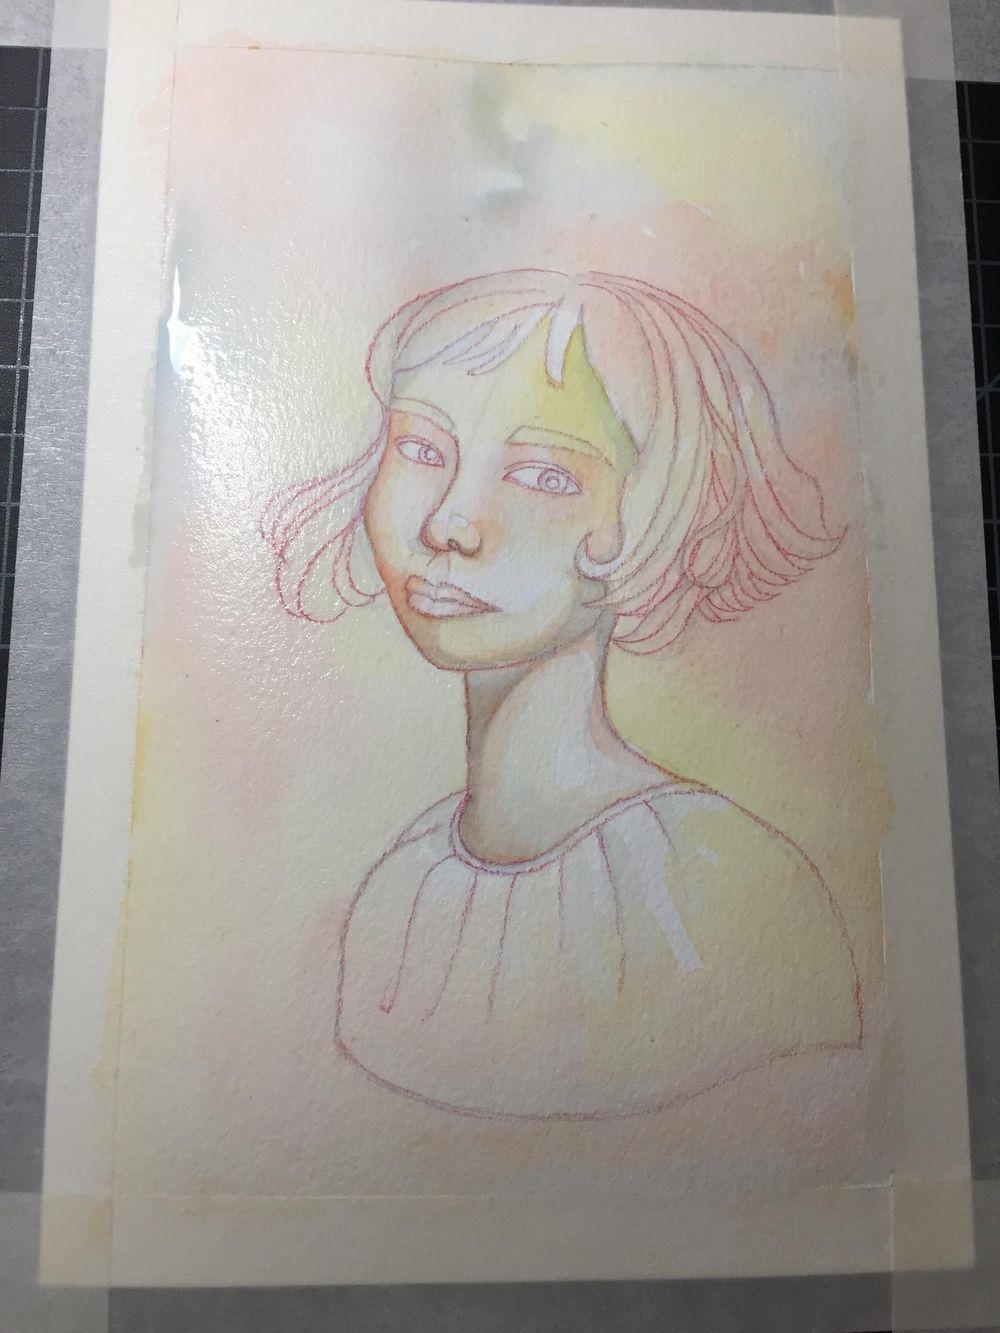 Rainbow Skin Portrait - image 2 - student project